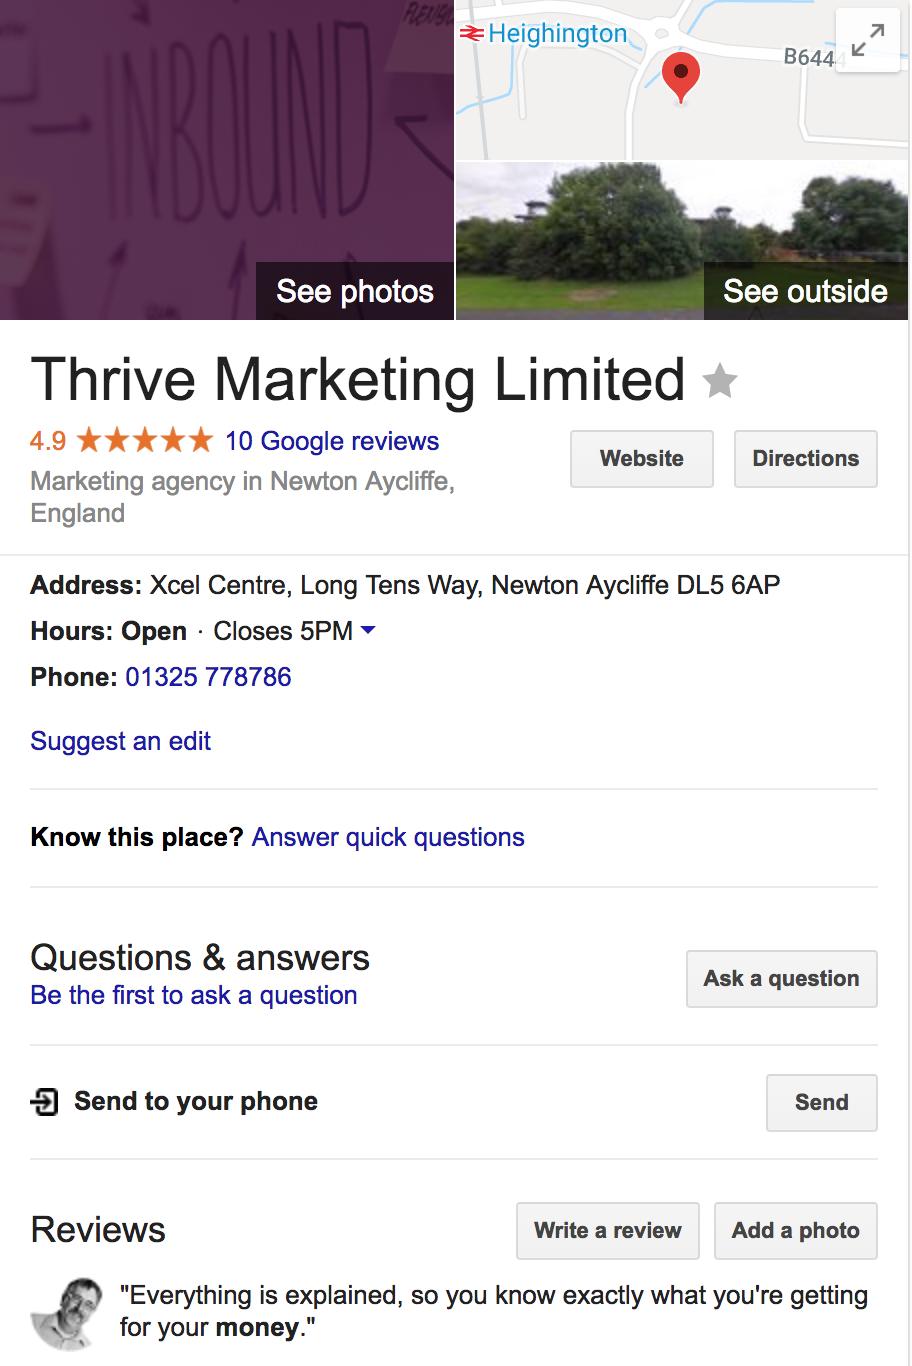 Thrive Marketing's Google My Business Listing